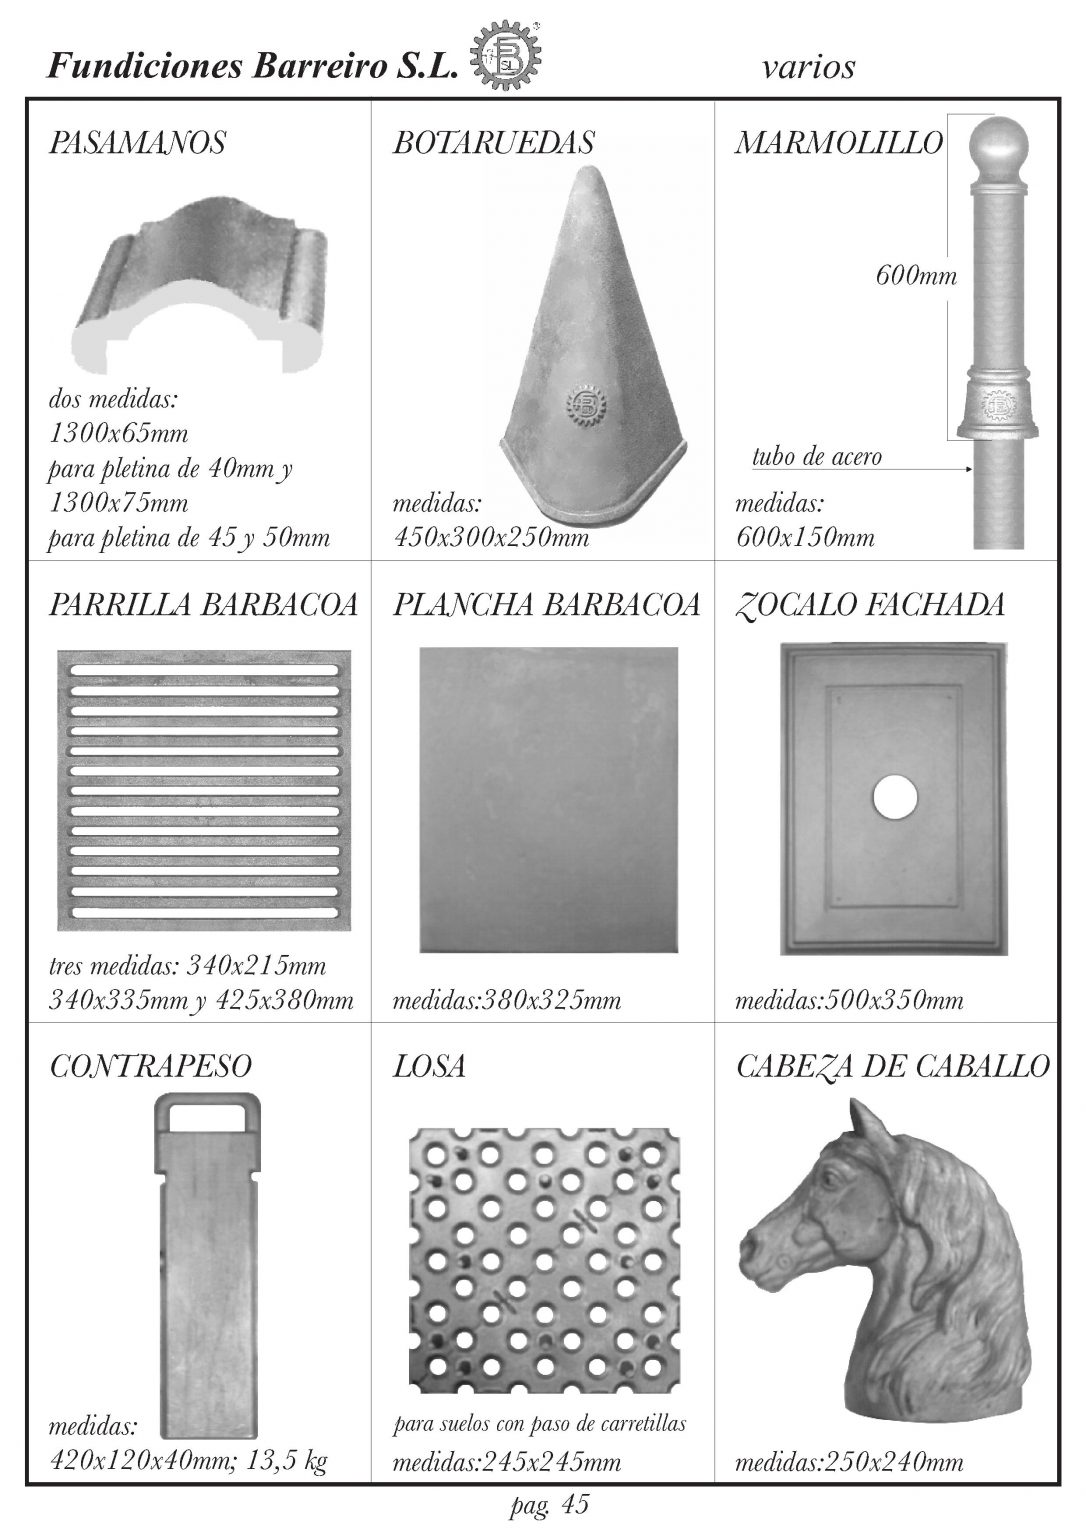 FUNDICIONES BARREIRO-CATALOGO IV-47